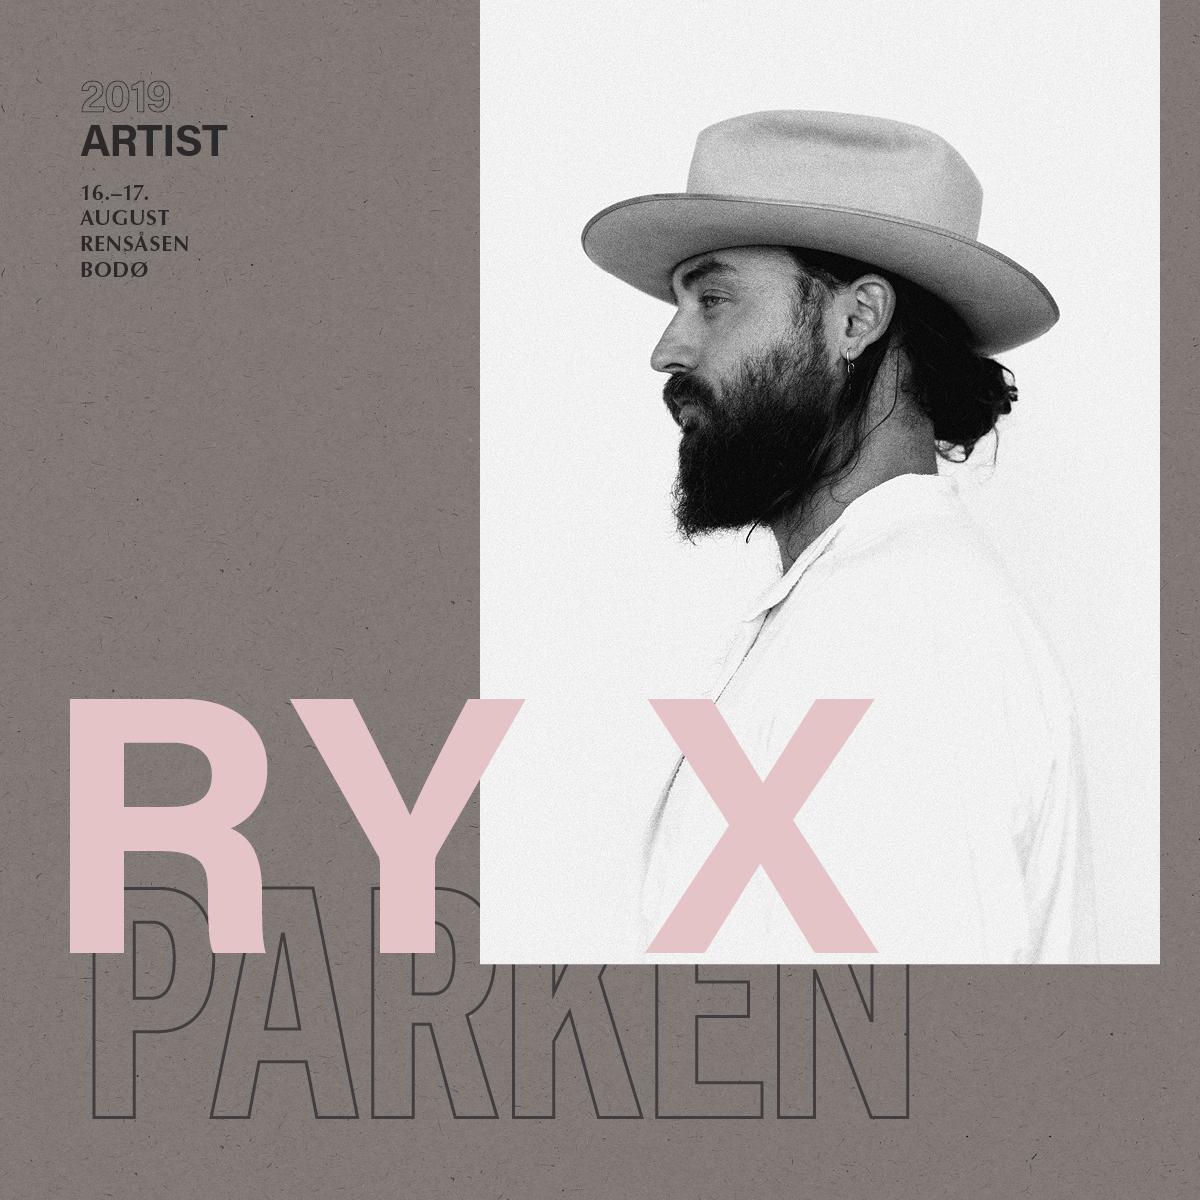 BYRAA_Parken_Artistslipp_2019_RY_X_1200x1200px.jpg